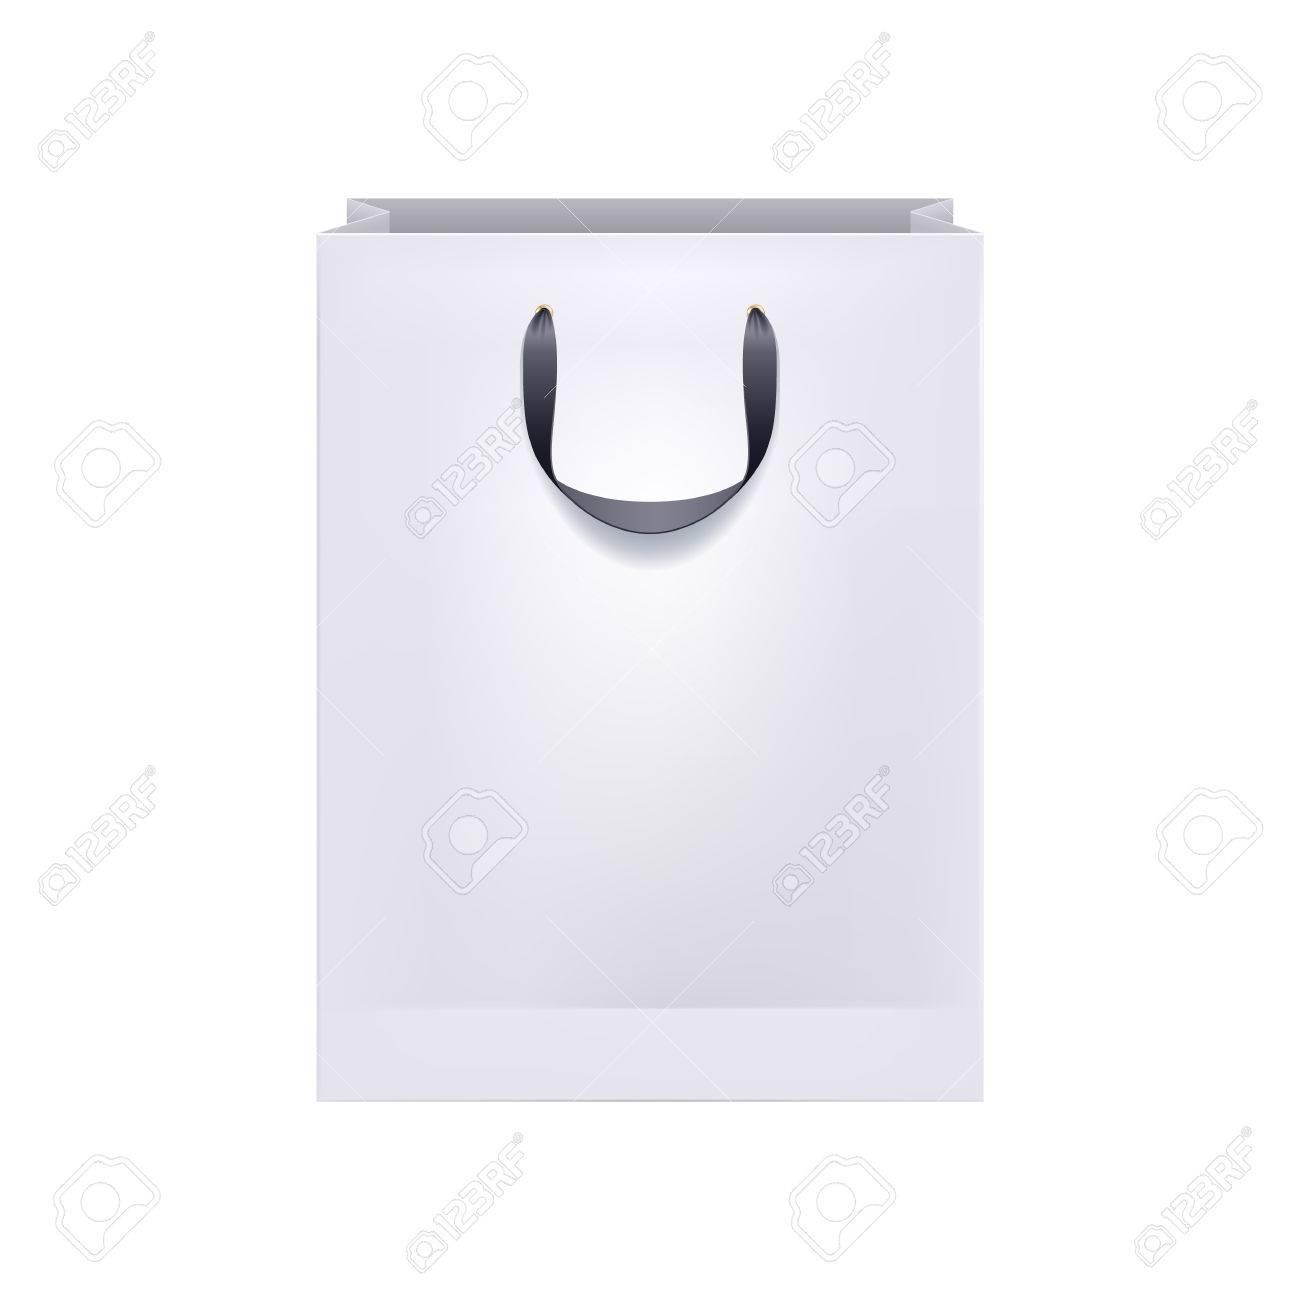 Paper bag vector - Blank White Paper Bag With Black Handles Packaging Design Mock Up Stock Vector